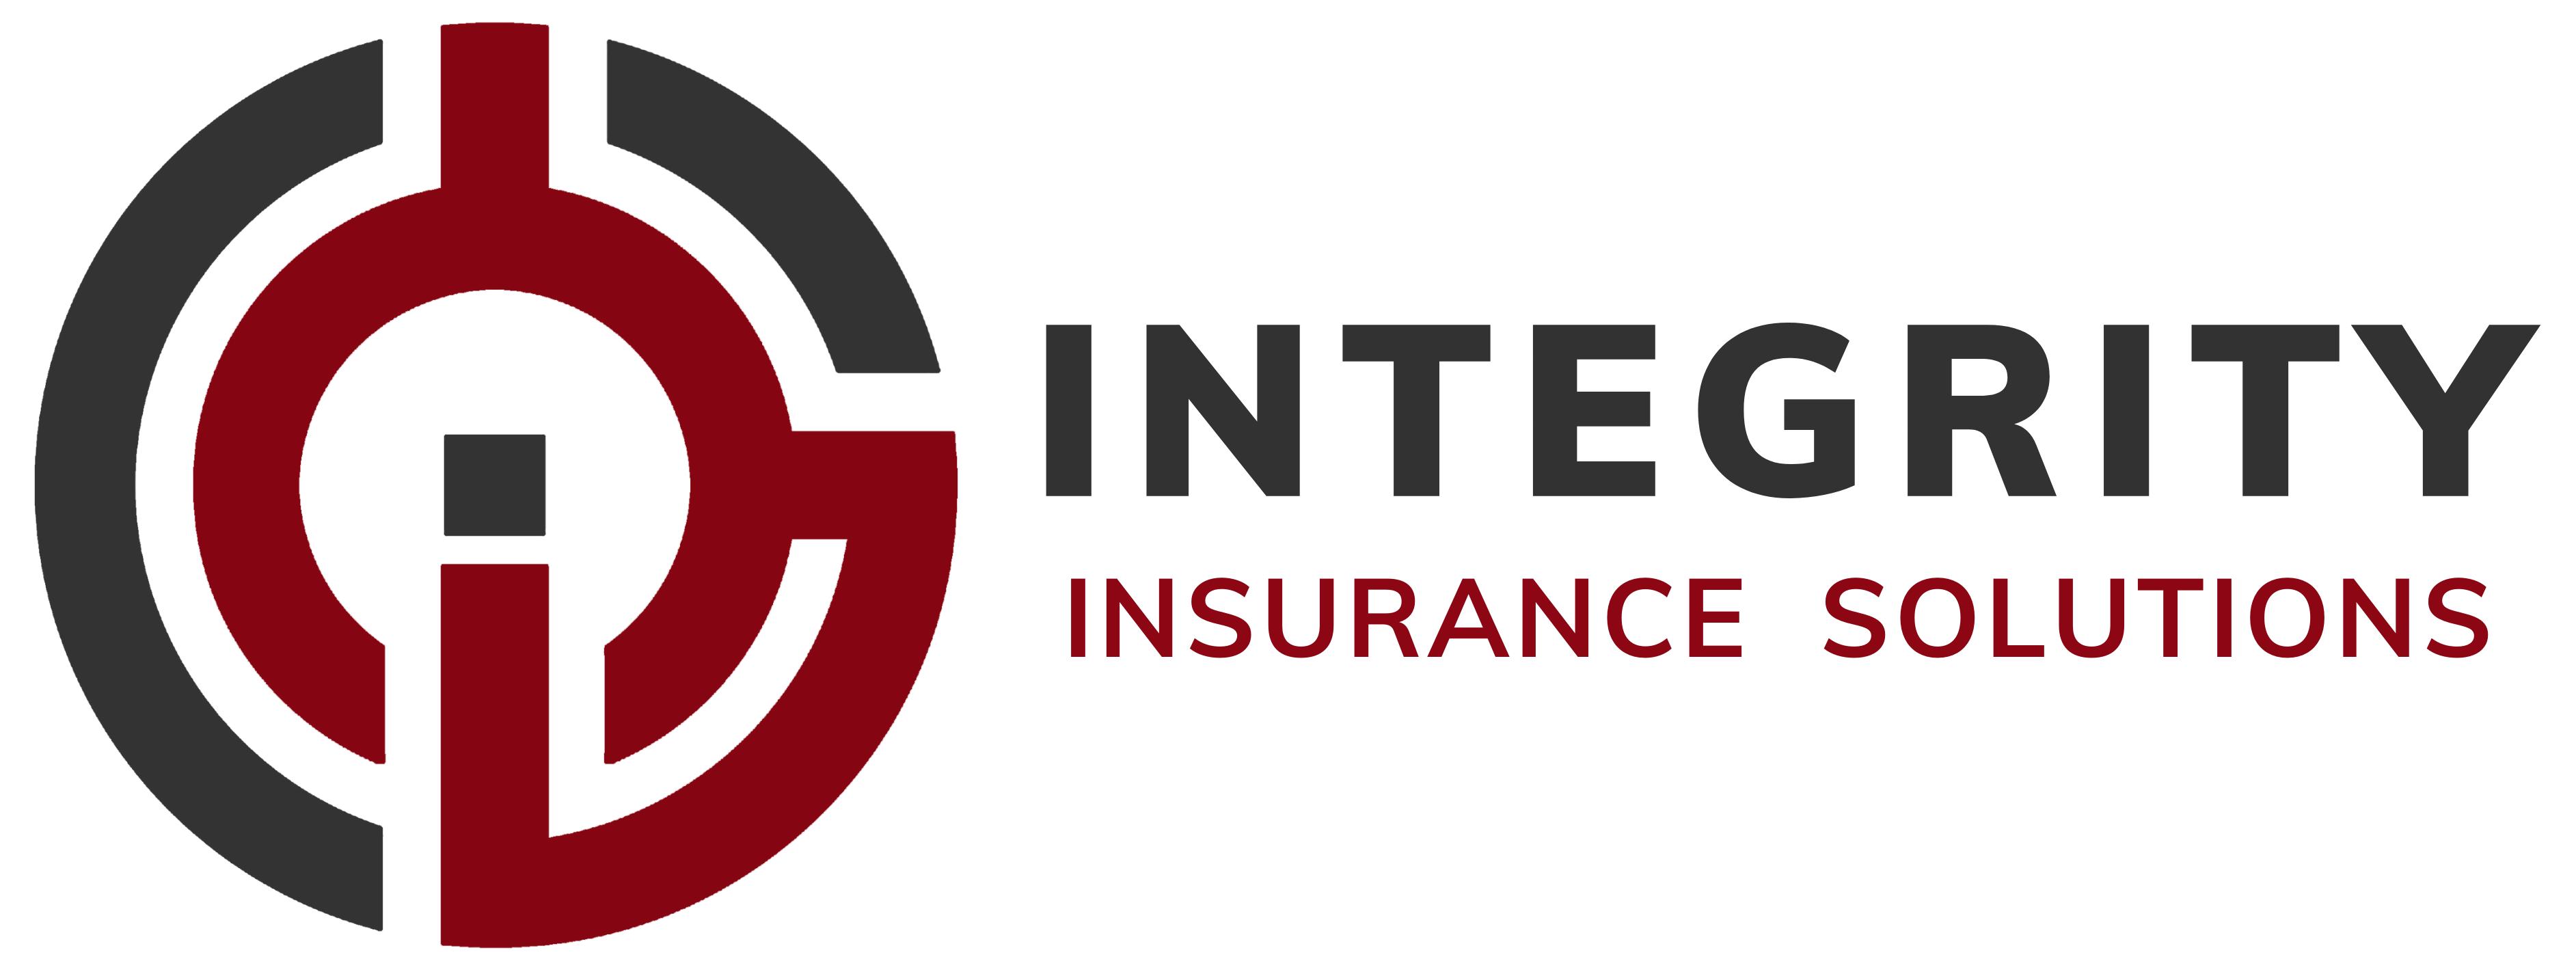 Integrity Insurance Solutions - Insurance Brokers Brisbane